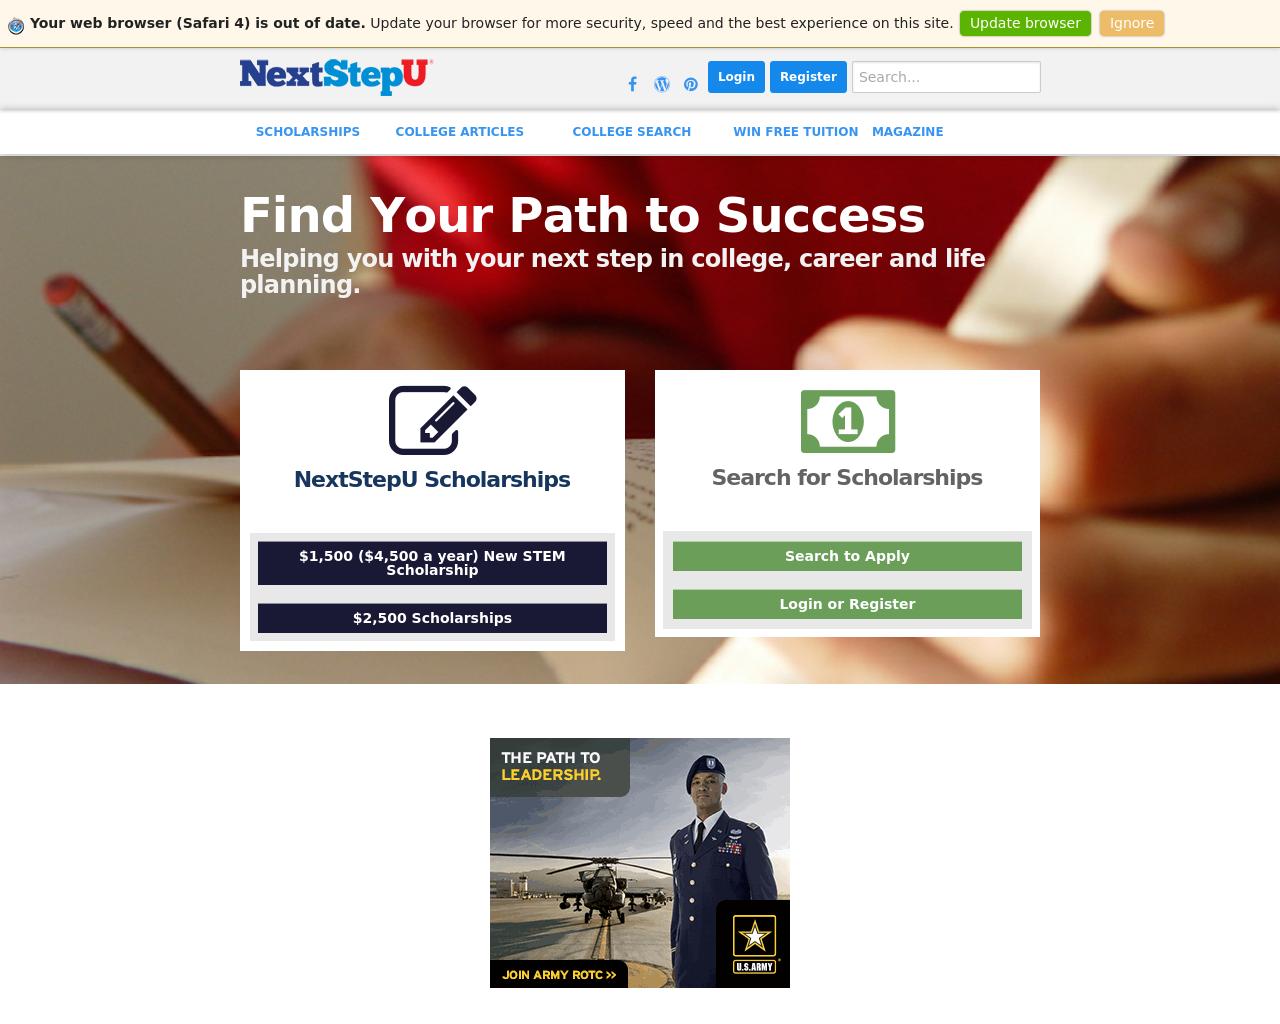 NextStepU-Advertising-Reviews-Pricing